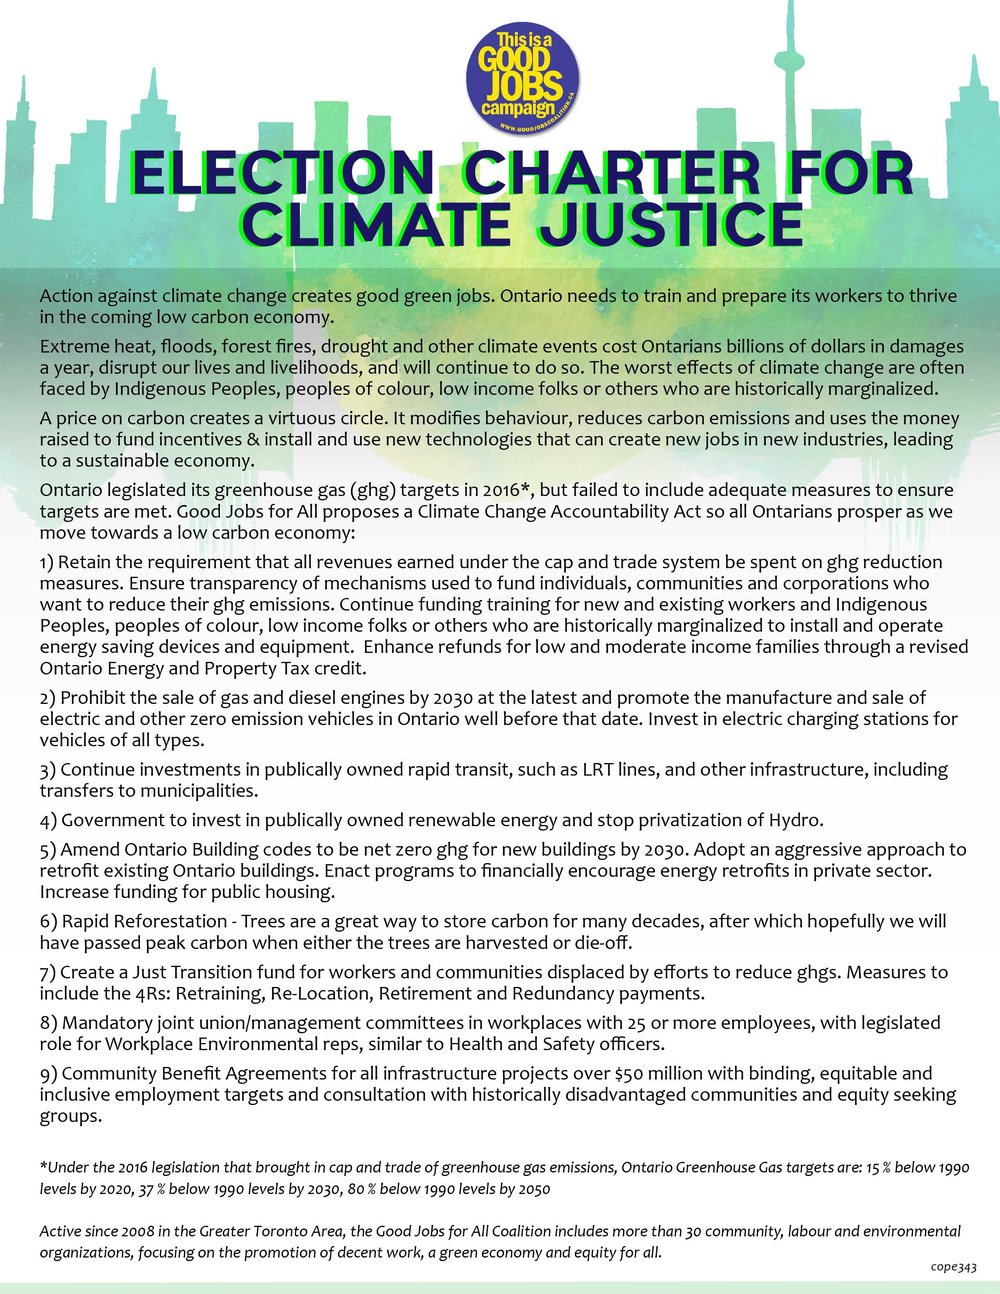 GoodJobs4All-Climate Charter.JPG